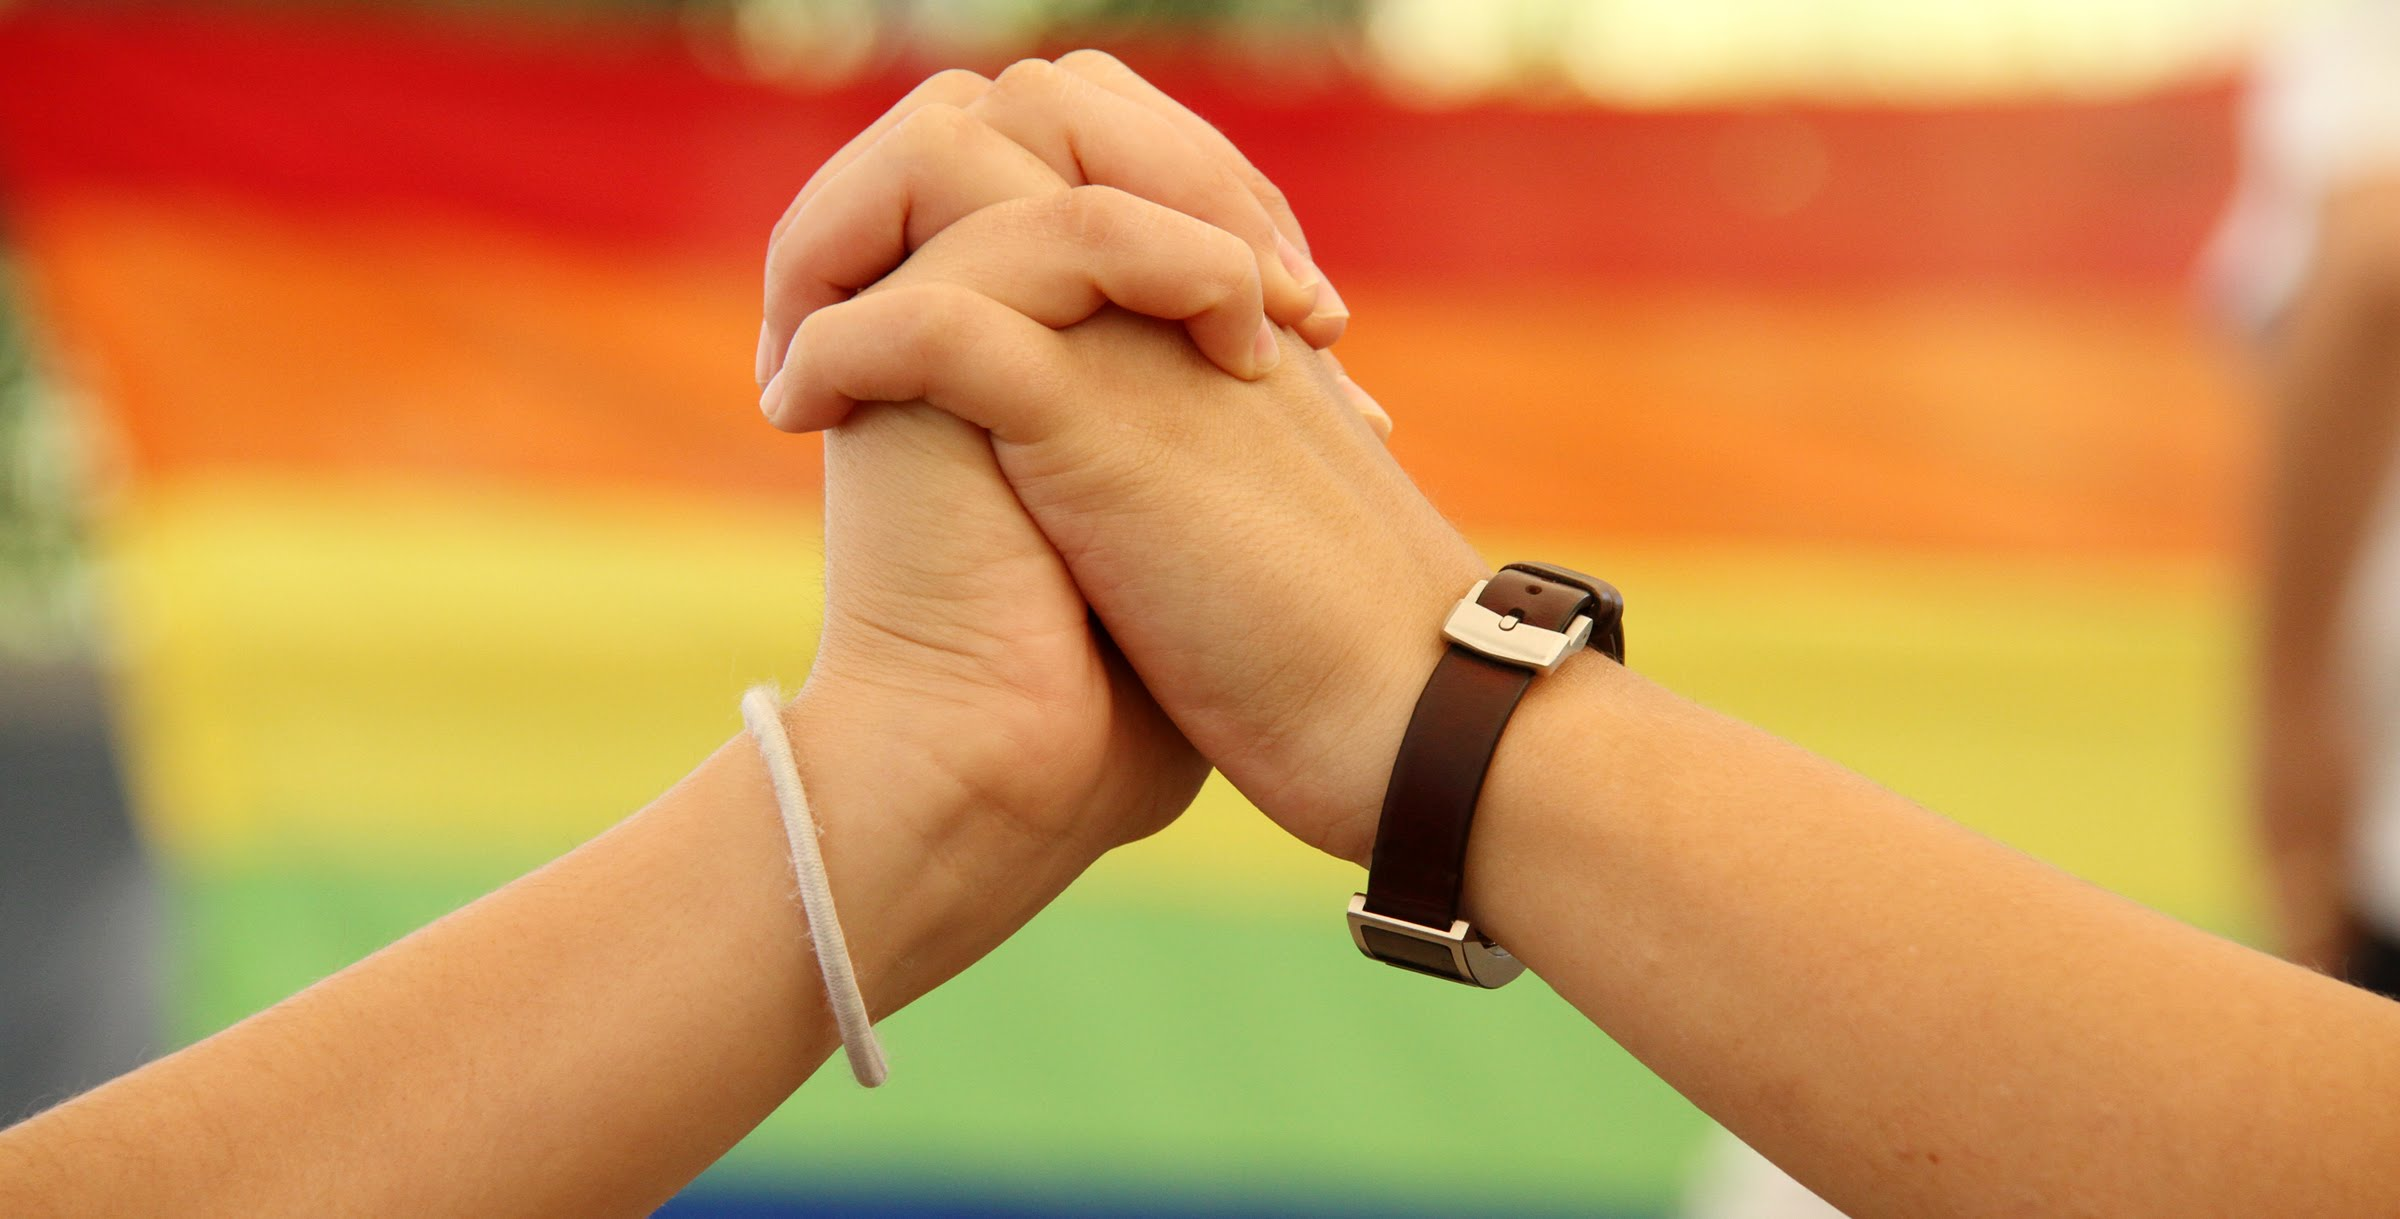 Diversidad Sexual - Sexuality